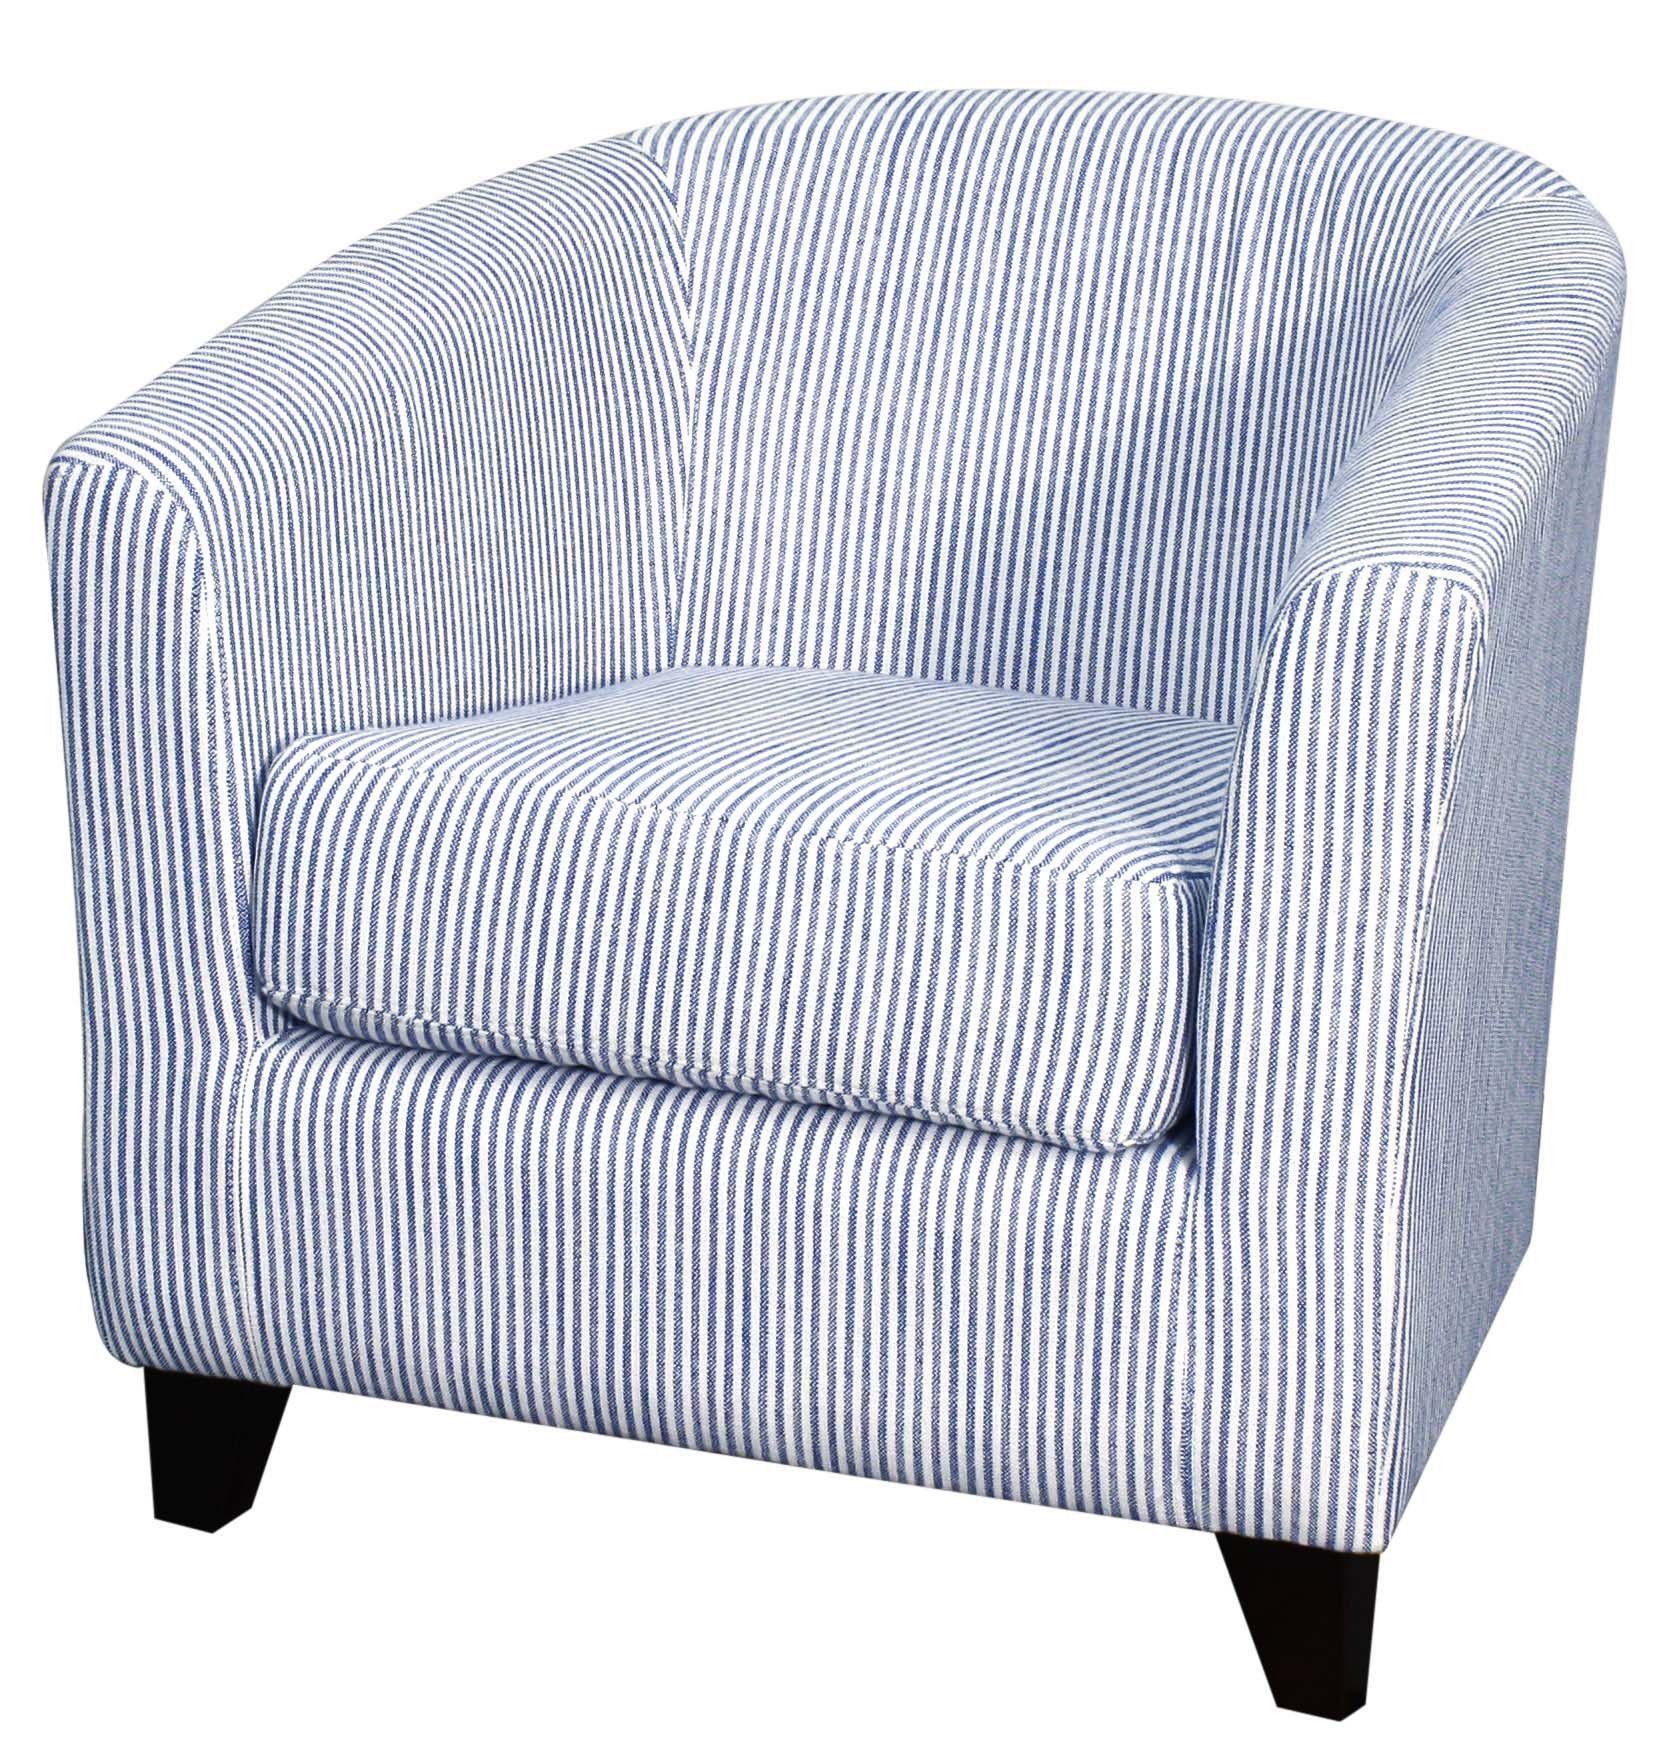 Hayden Fabric Tub Chair Black Legs, Blue Stripes | Products ...